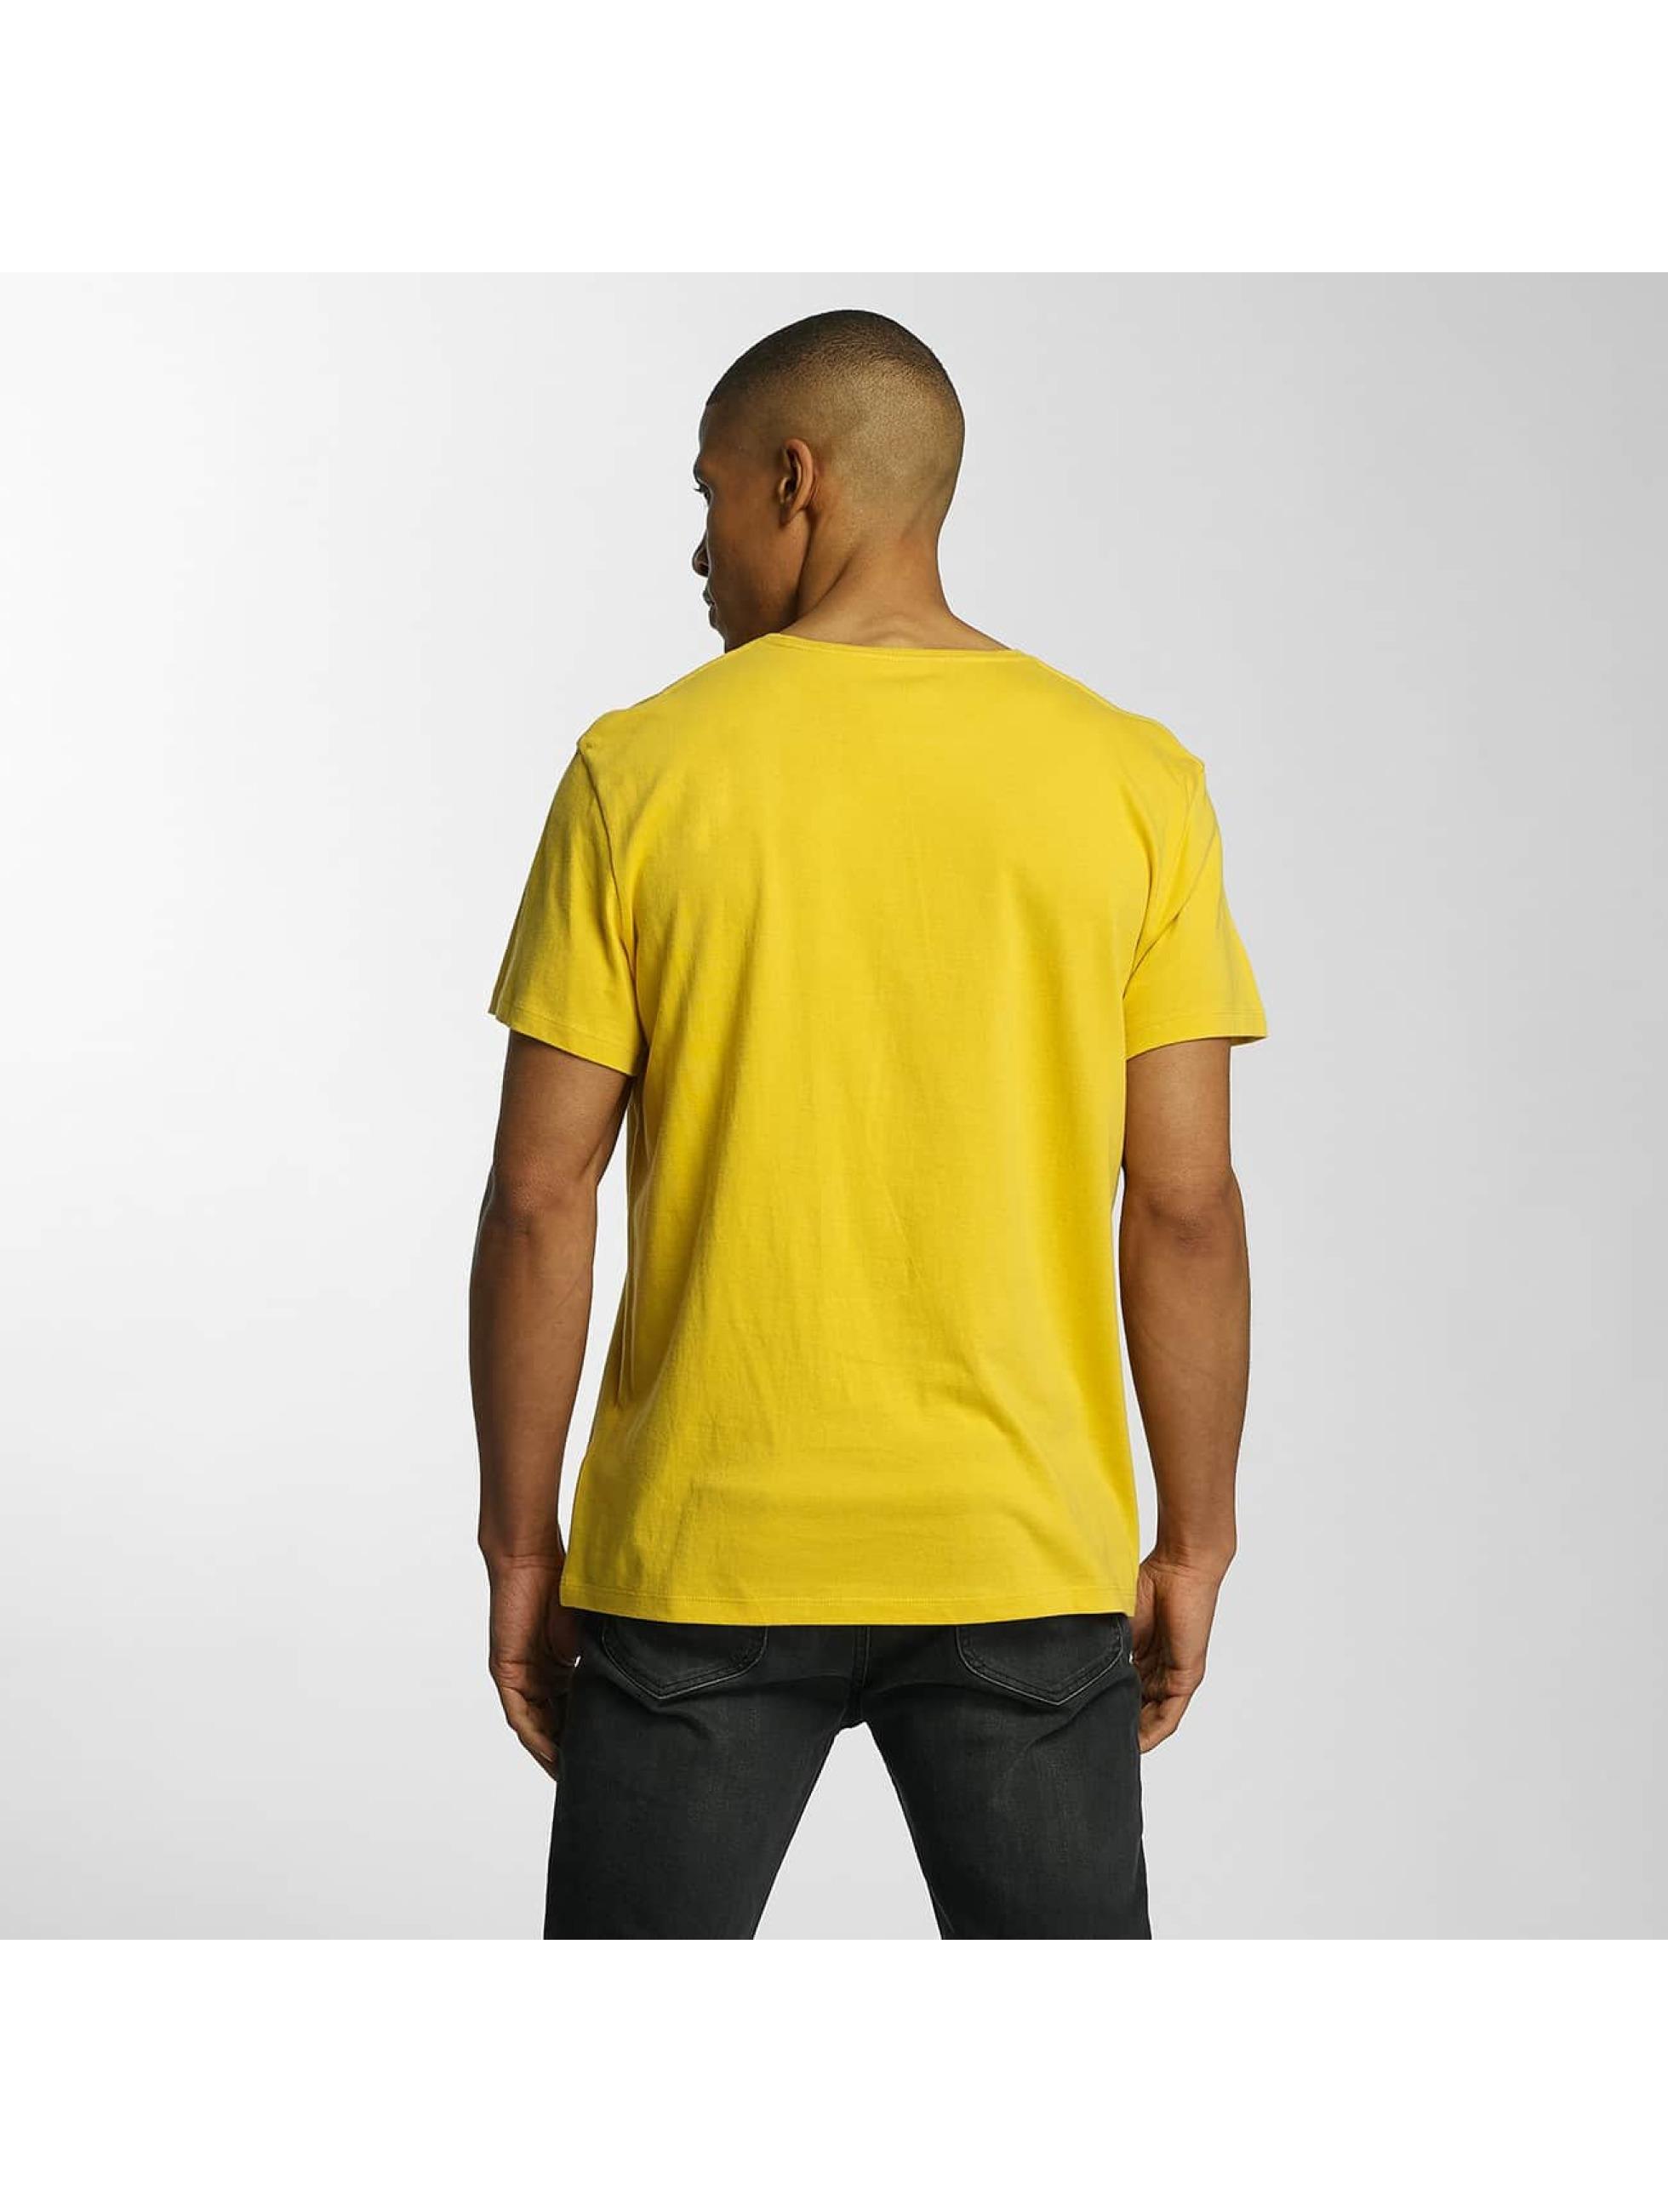 Timberland T-shirt Big Logo giallo